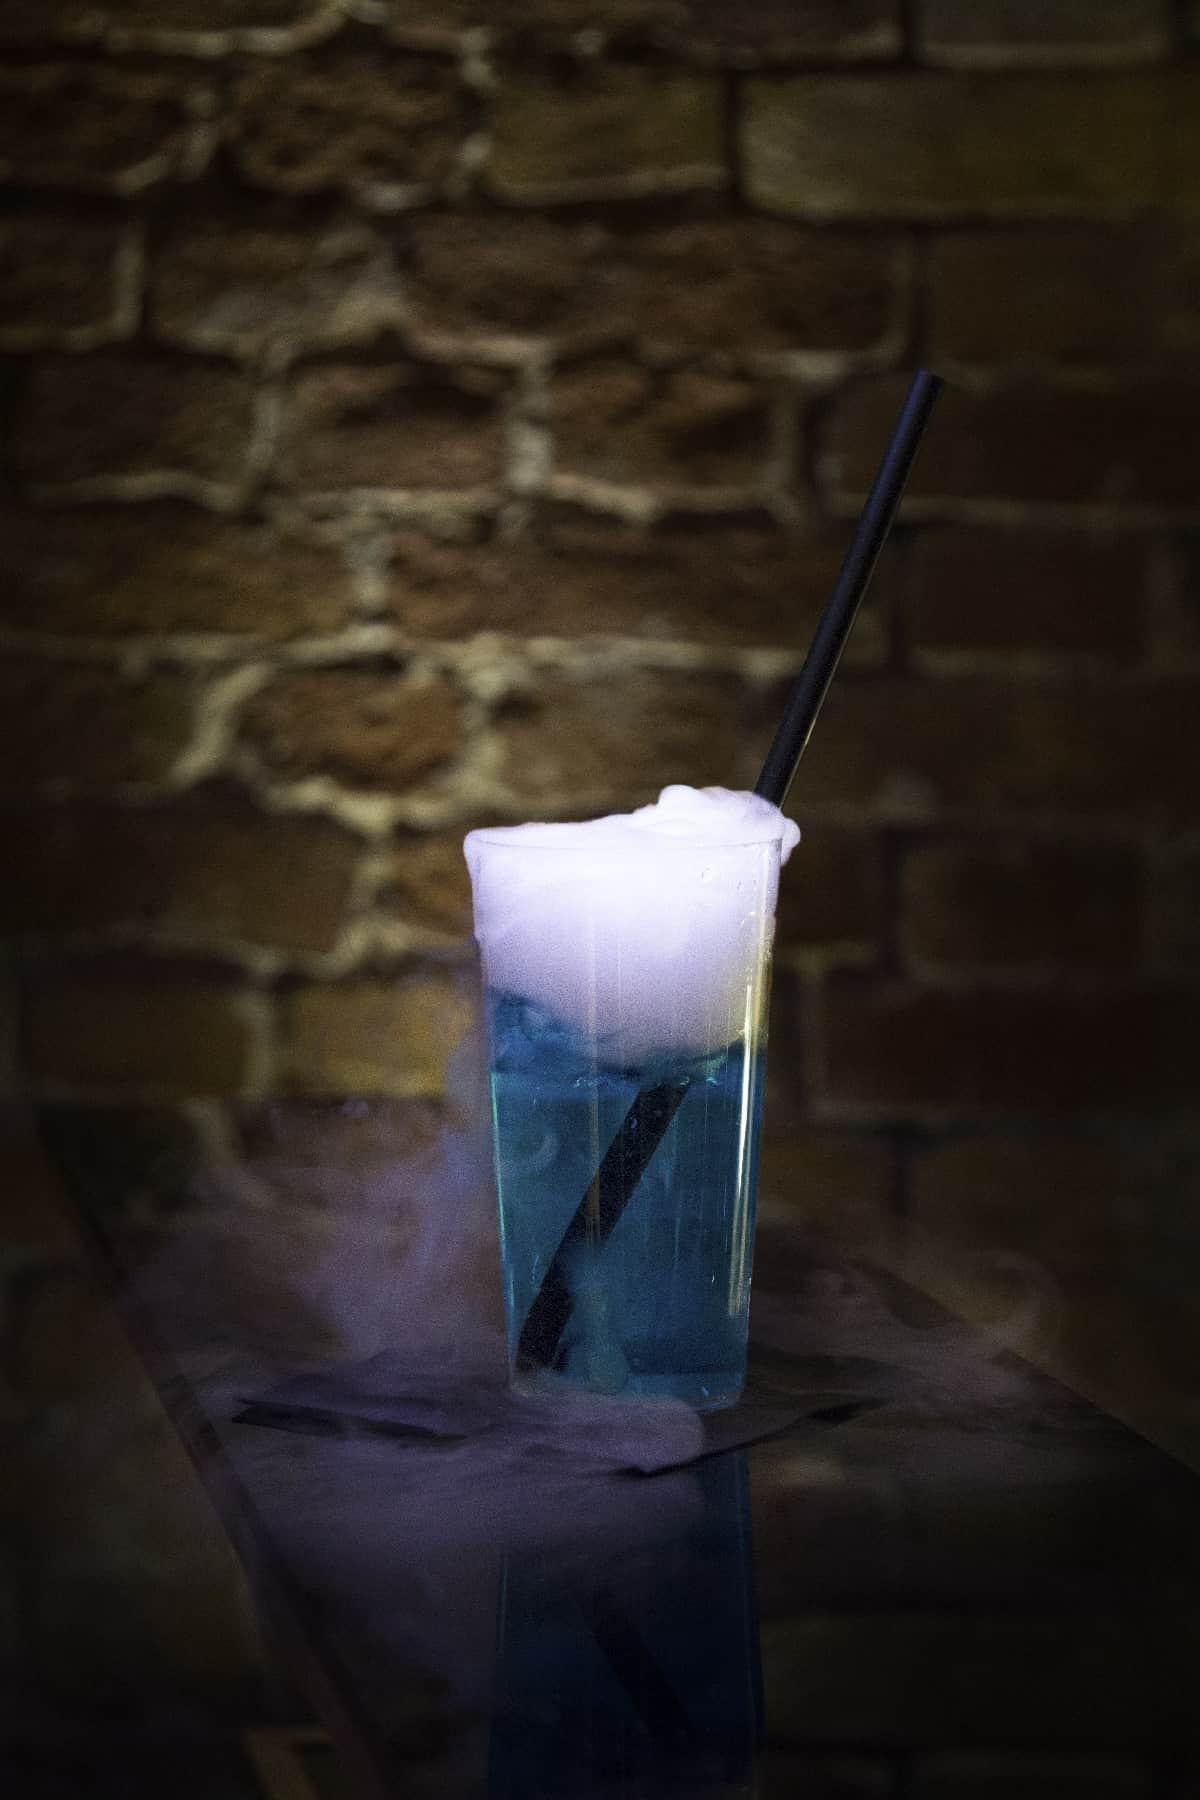 Rezeptur Atlantic Fog: Gin, Blue Curacao, Tonic wasser